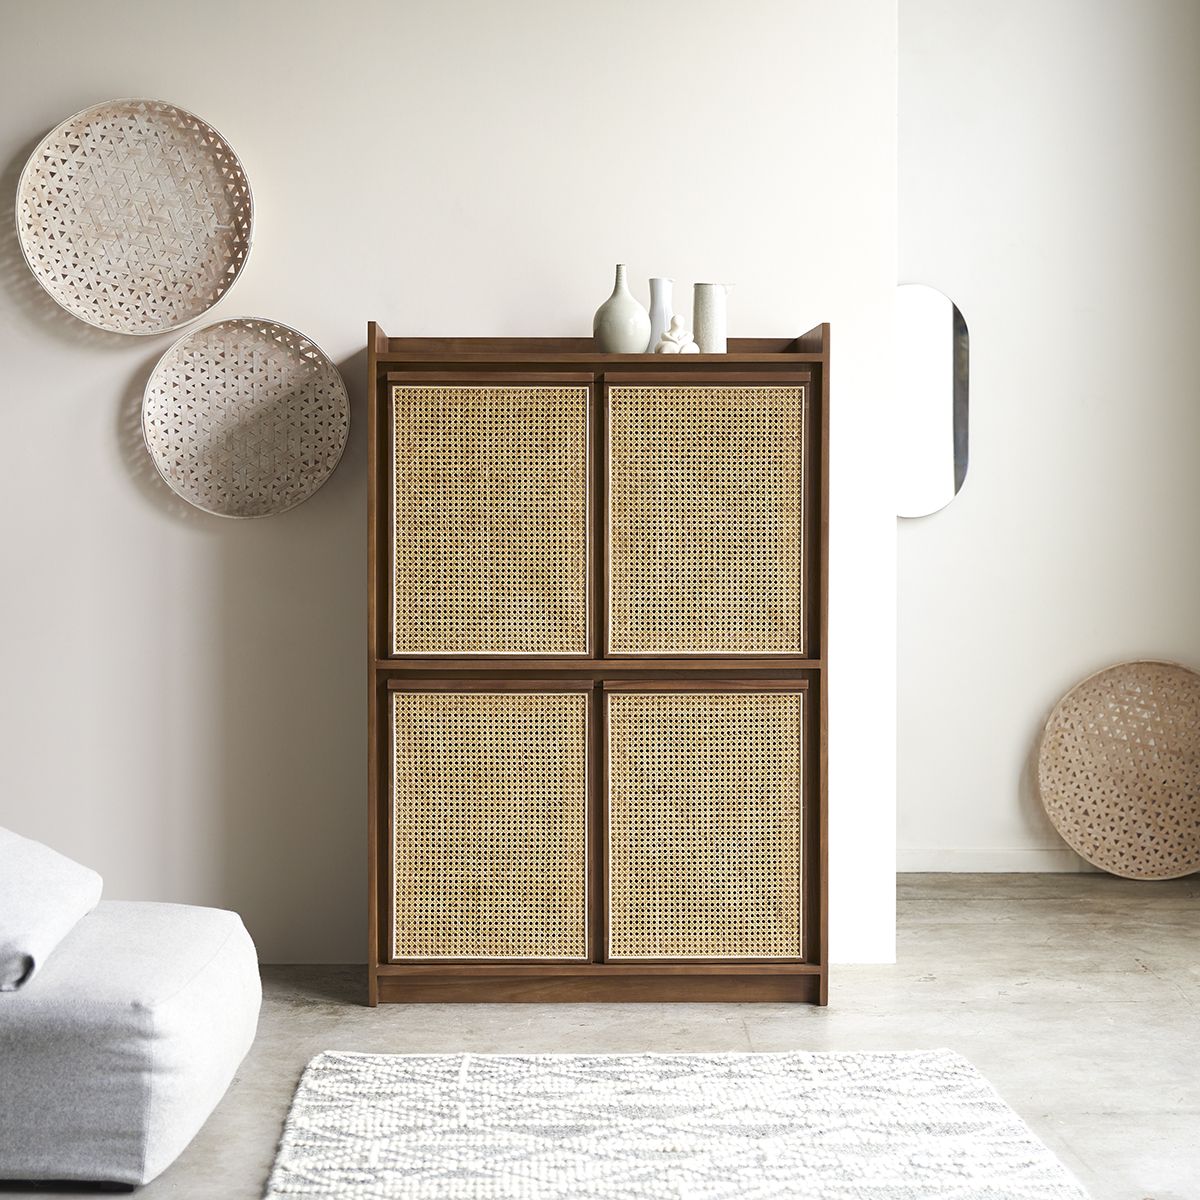 Roots solid teak and canework Dresser 105 cm